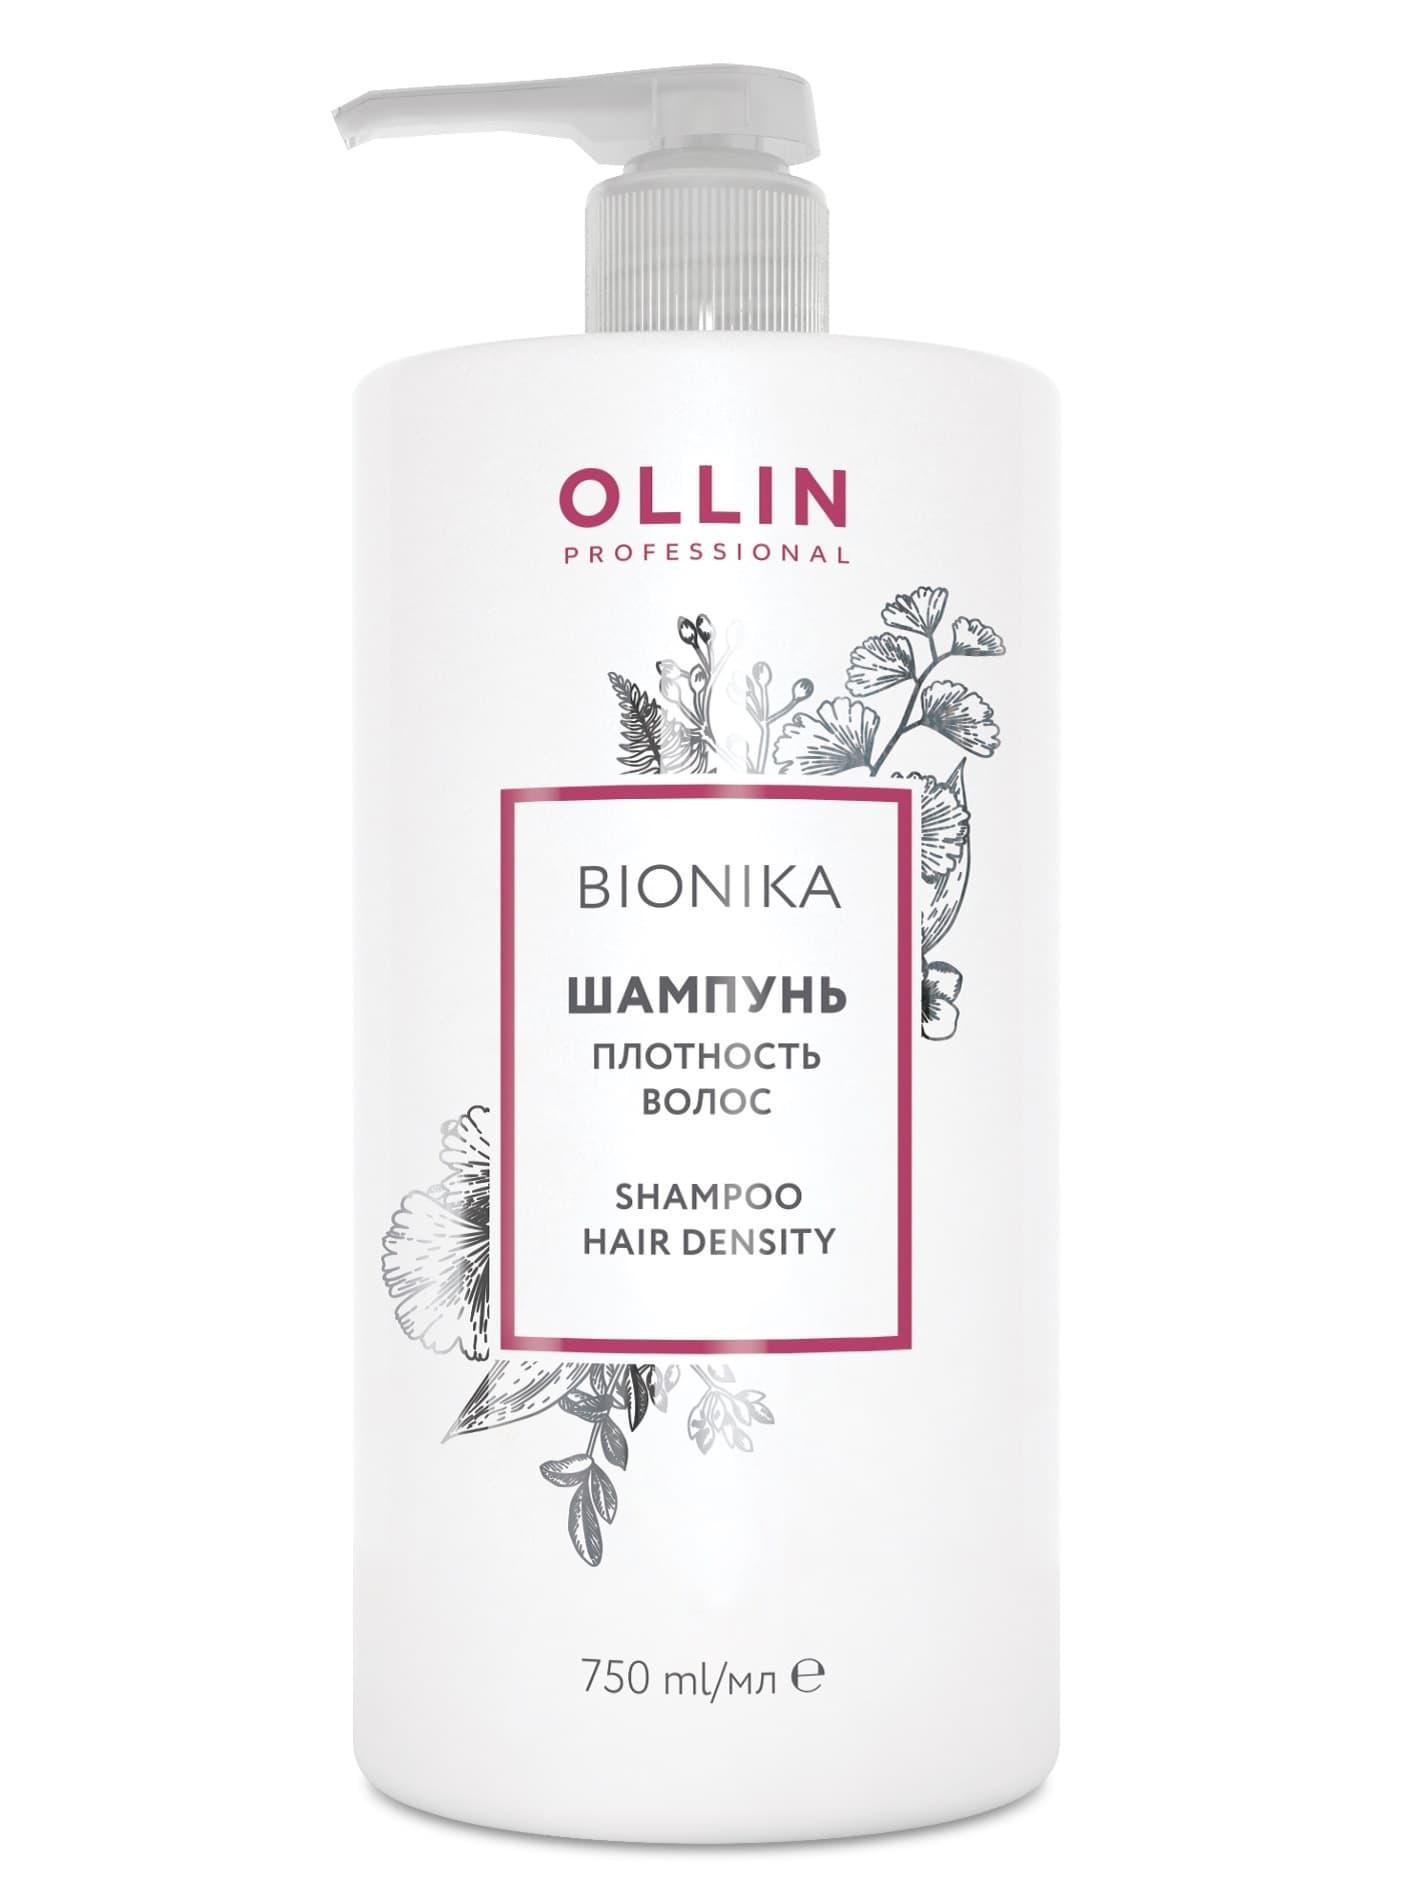 "OLLIN BioNika Шампунь ""Плотность волос"", 750 мл."